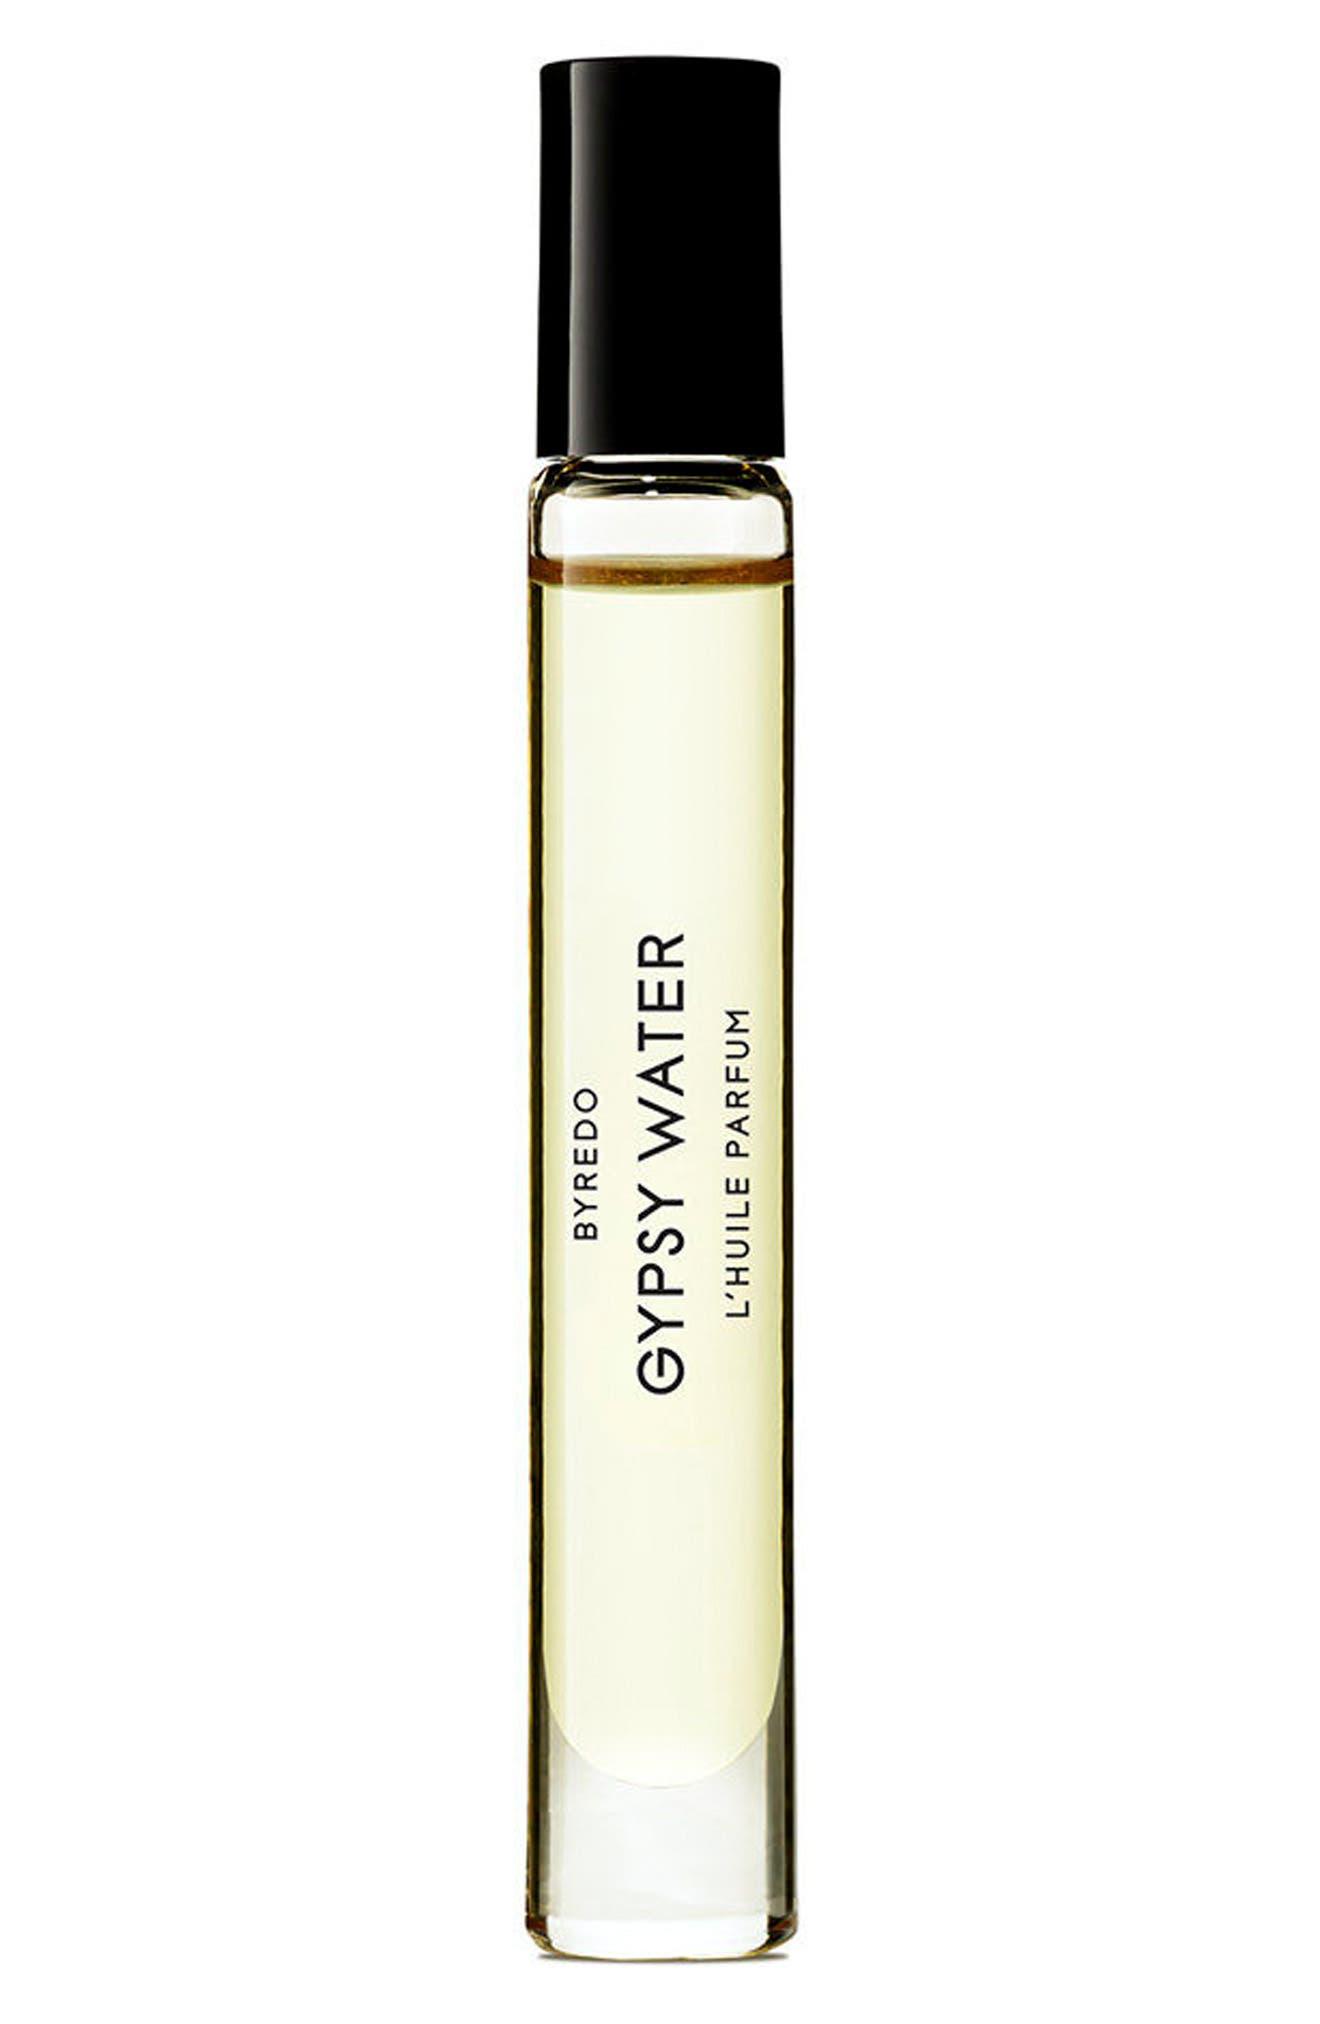 Alternate Image 1 Selected - BYREDO Gypsy Water Eau de Parfum Rollerball